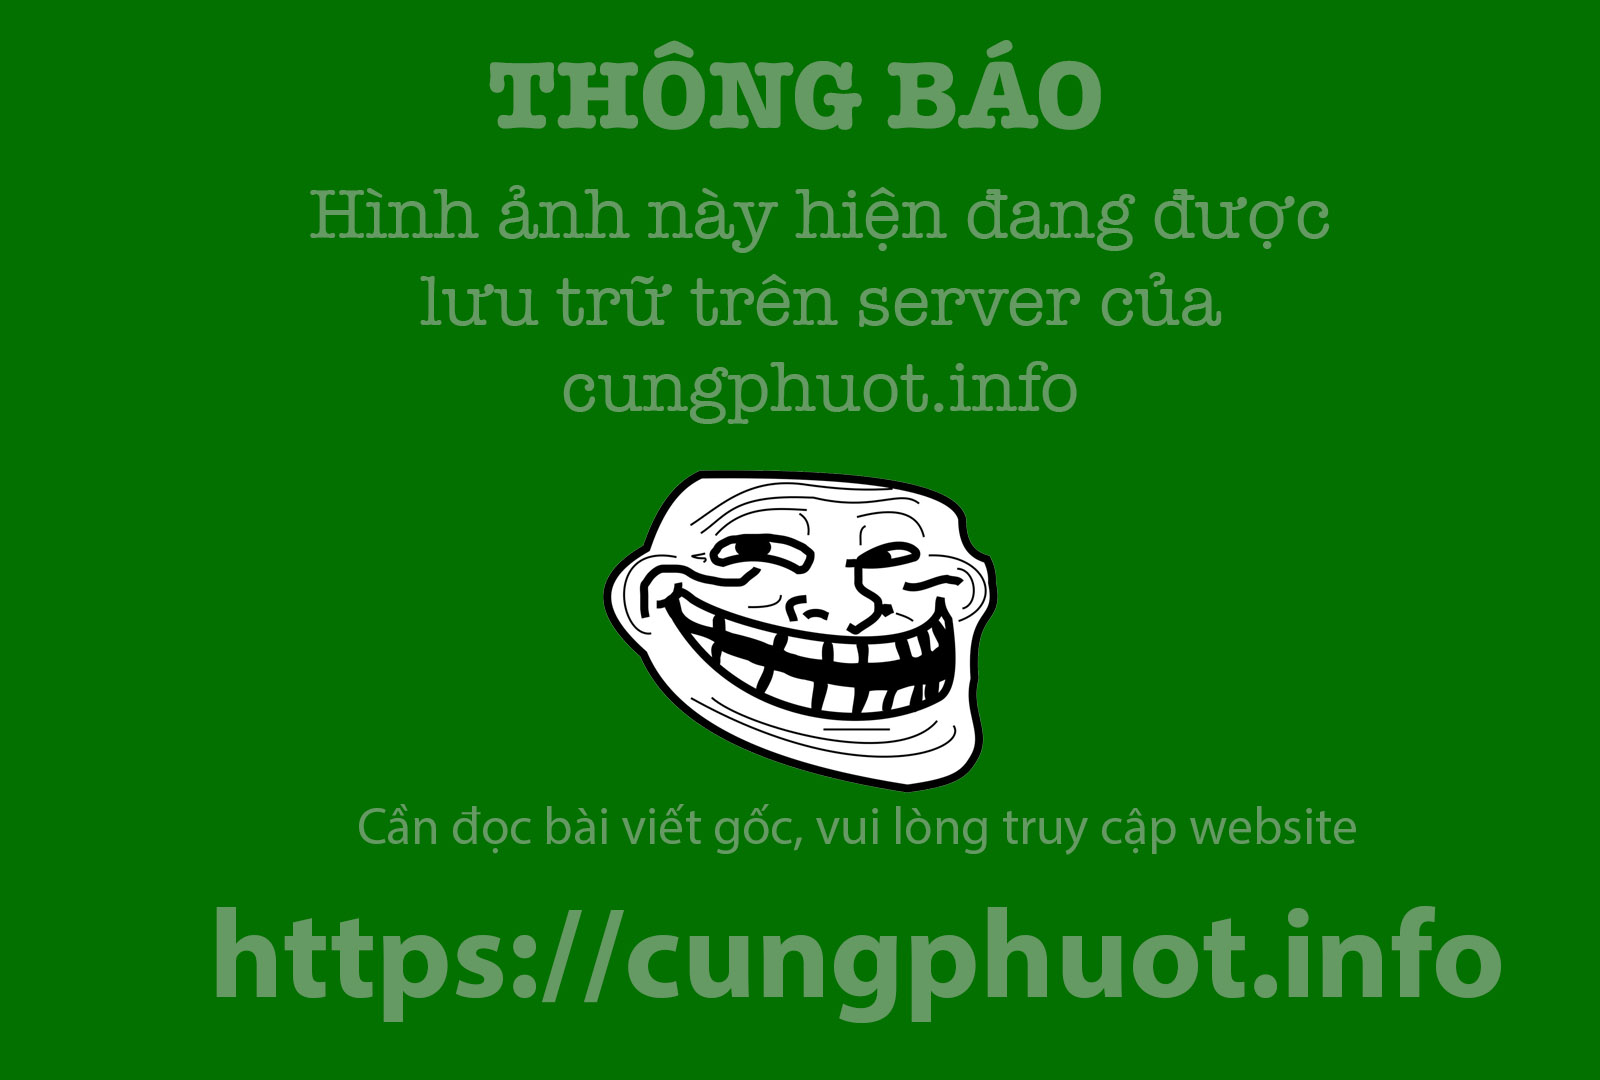 Co do Hue dep la trong suong mu hinh anh 14